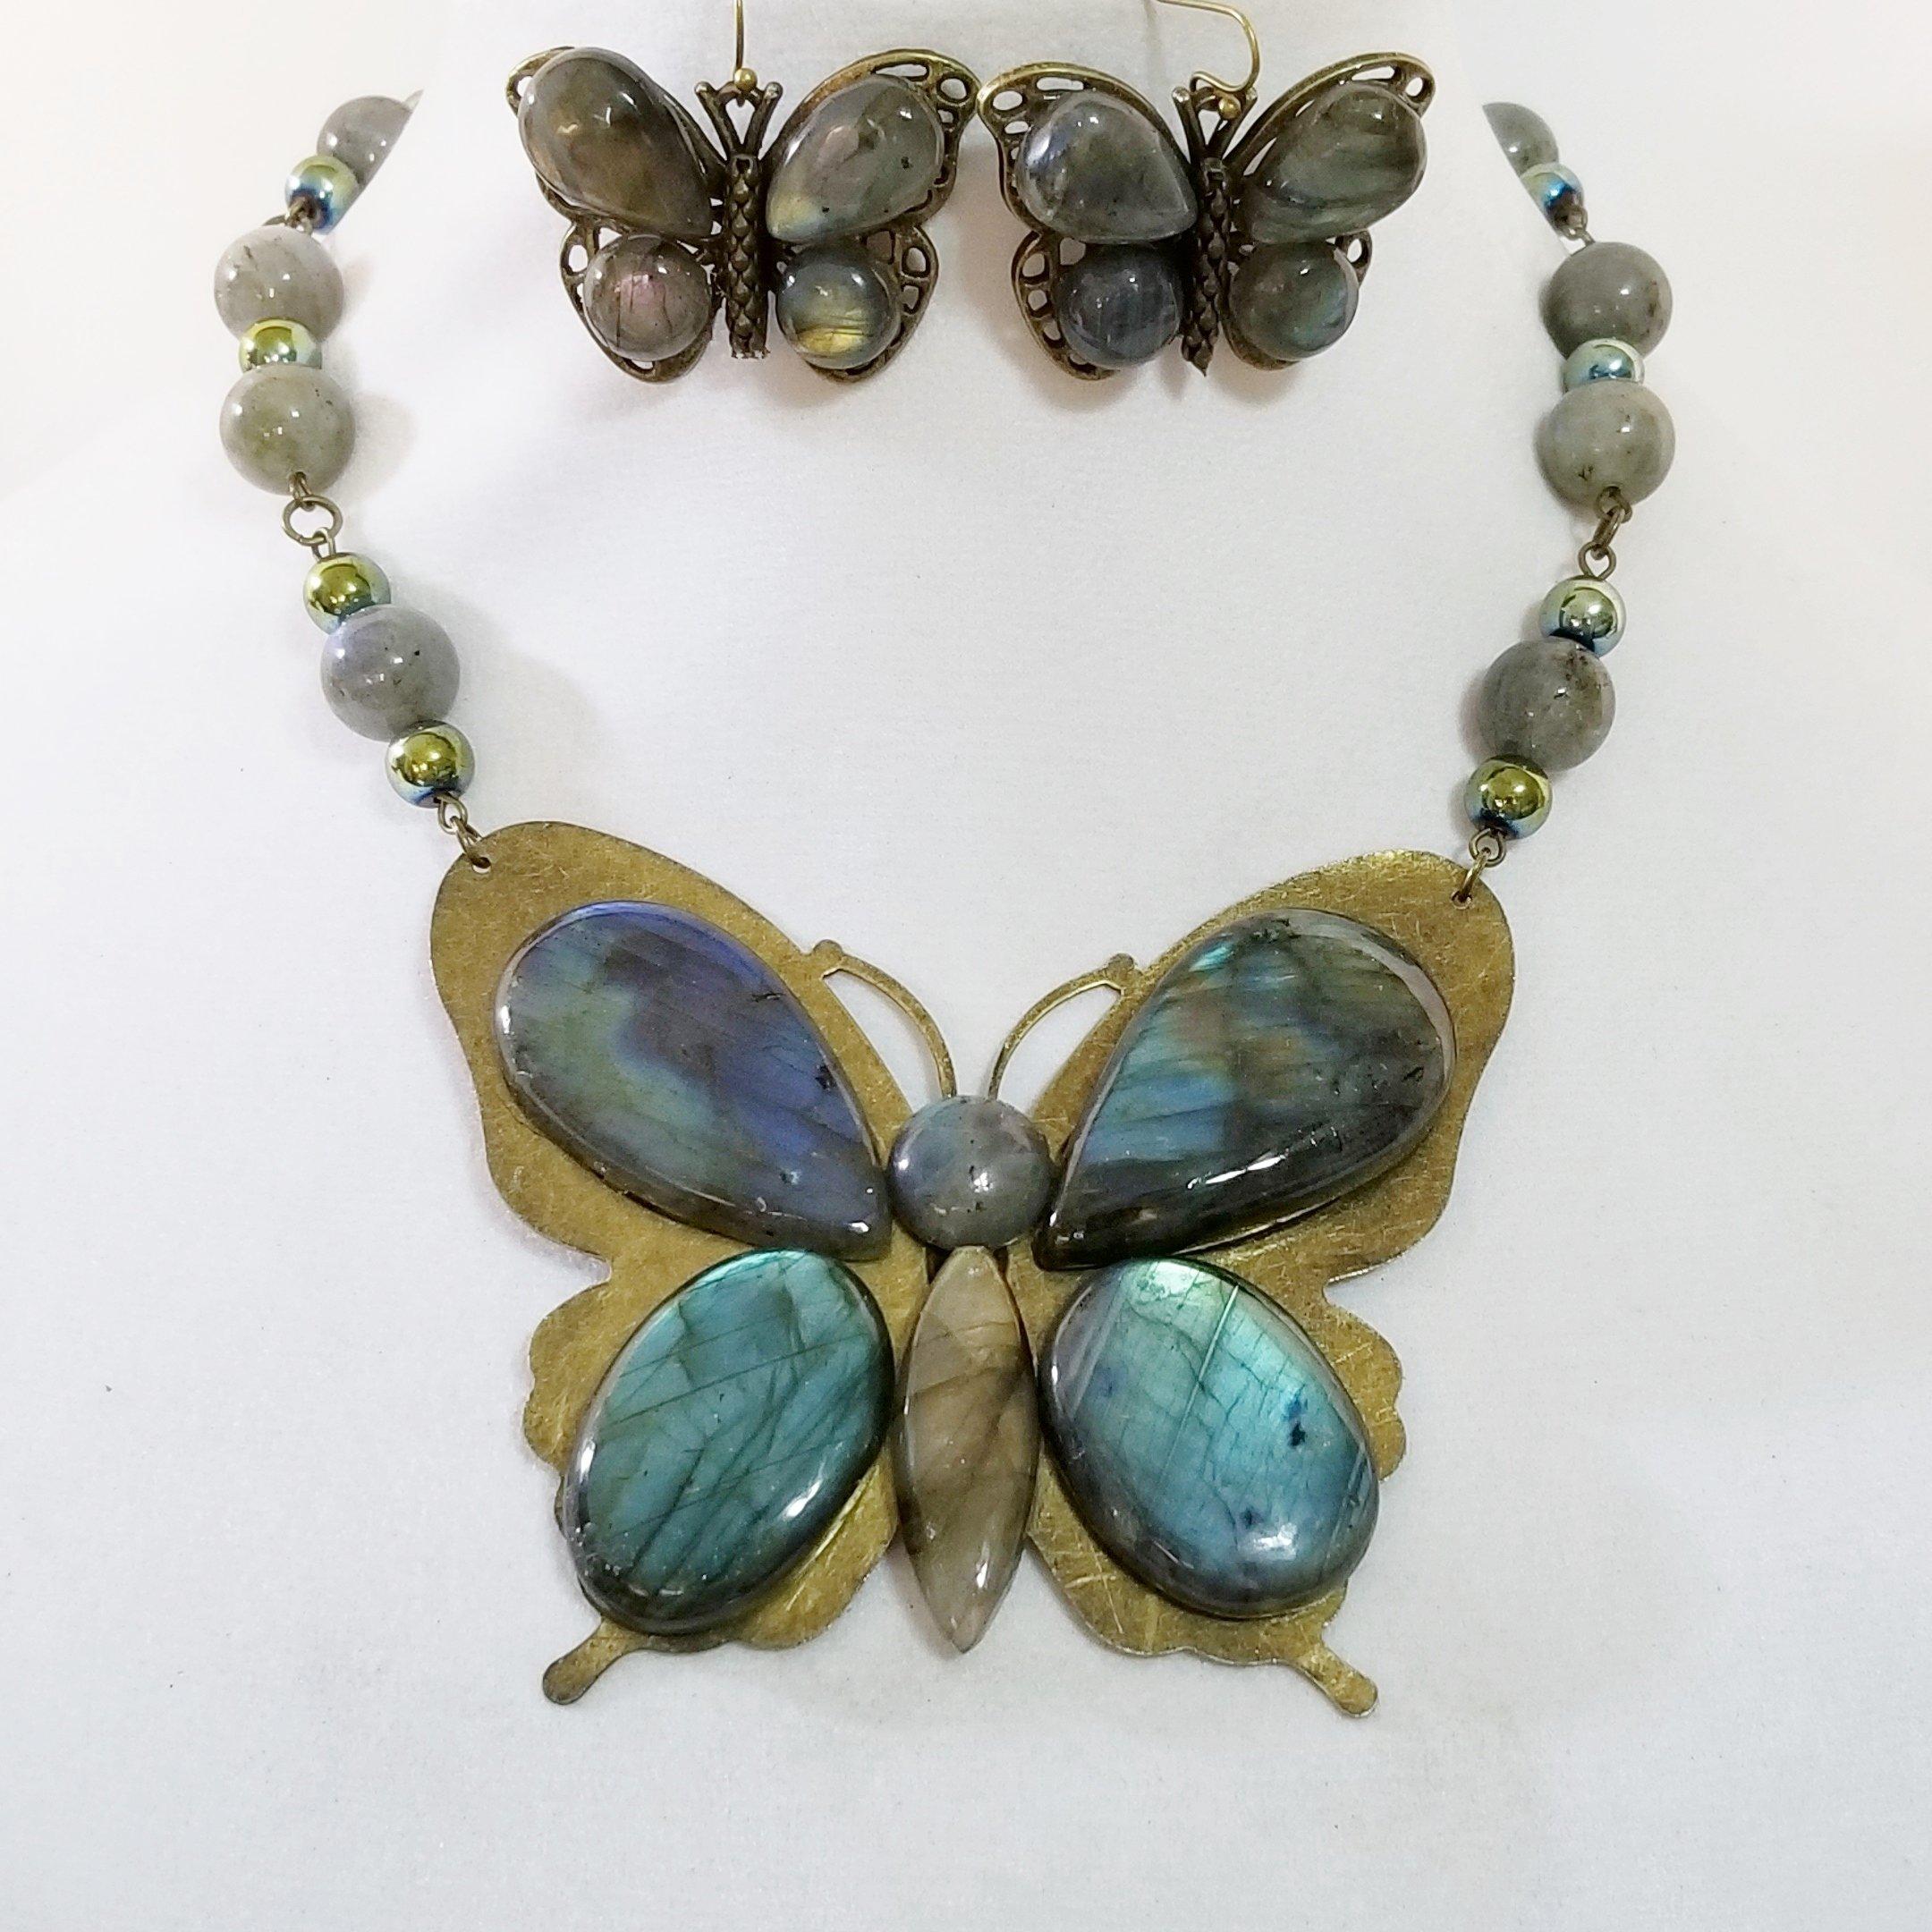 Big Butterfly Pendant Gemstone Labradorite Necklace Earrings Handmade